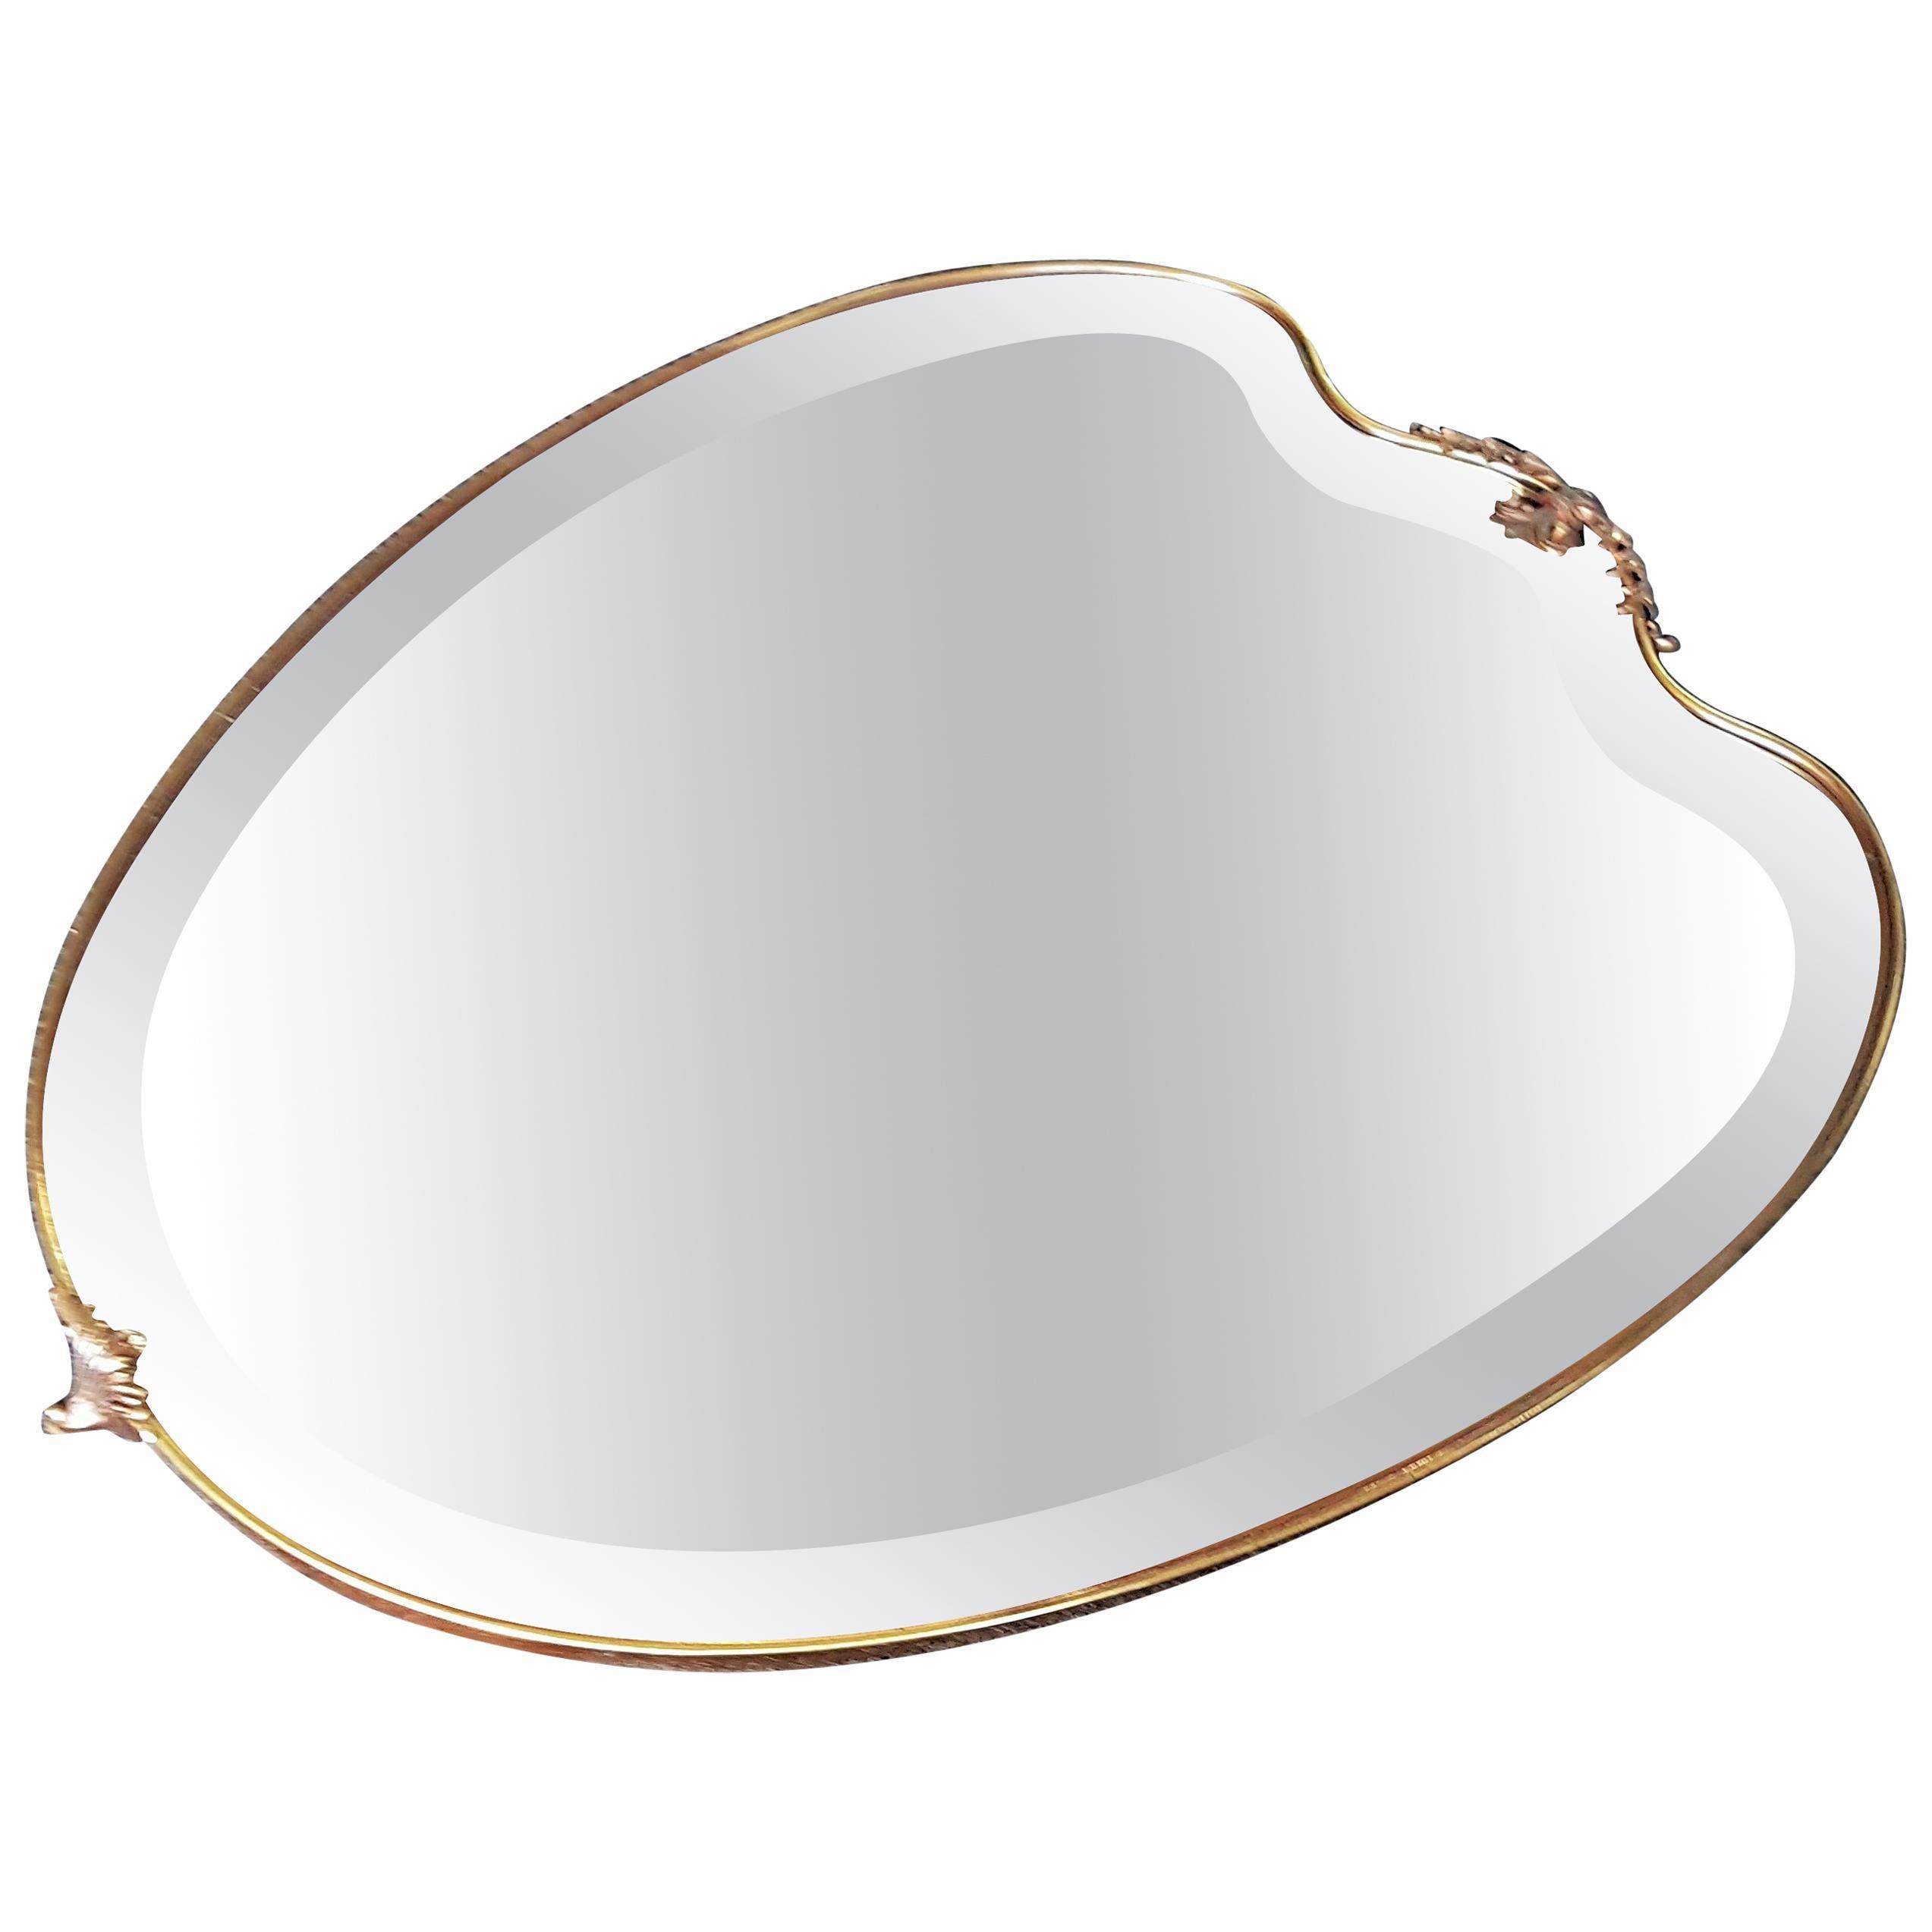 Midcentury Wall Mirror Brass, Shield Shaped, Style Ponti, Italy, 1950s